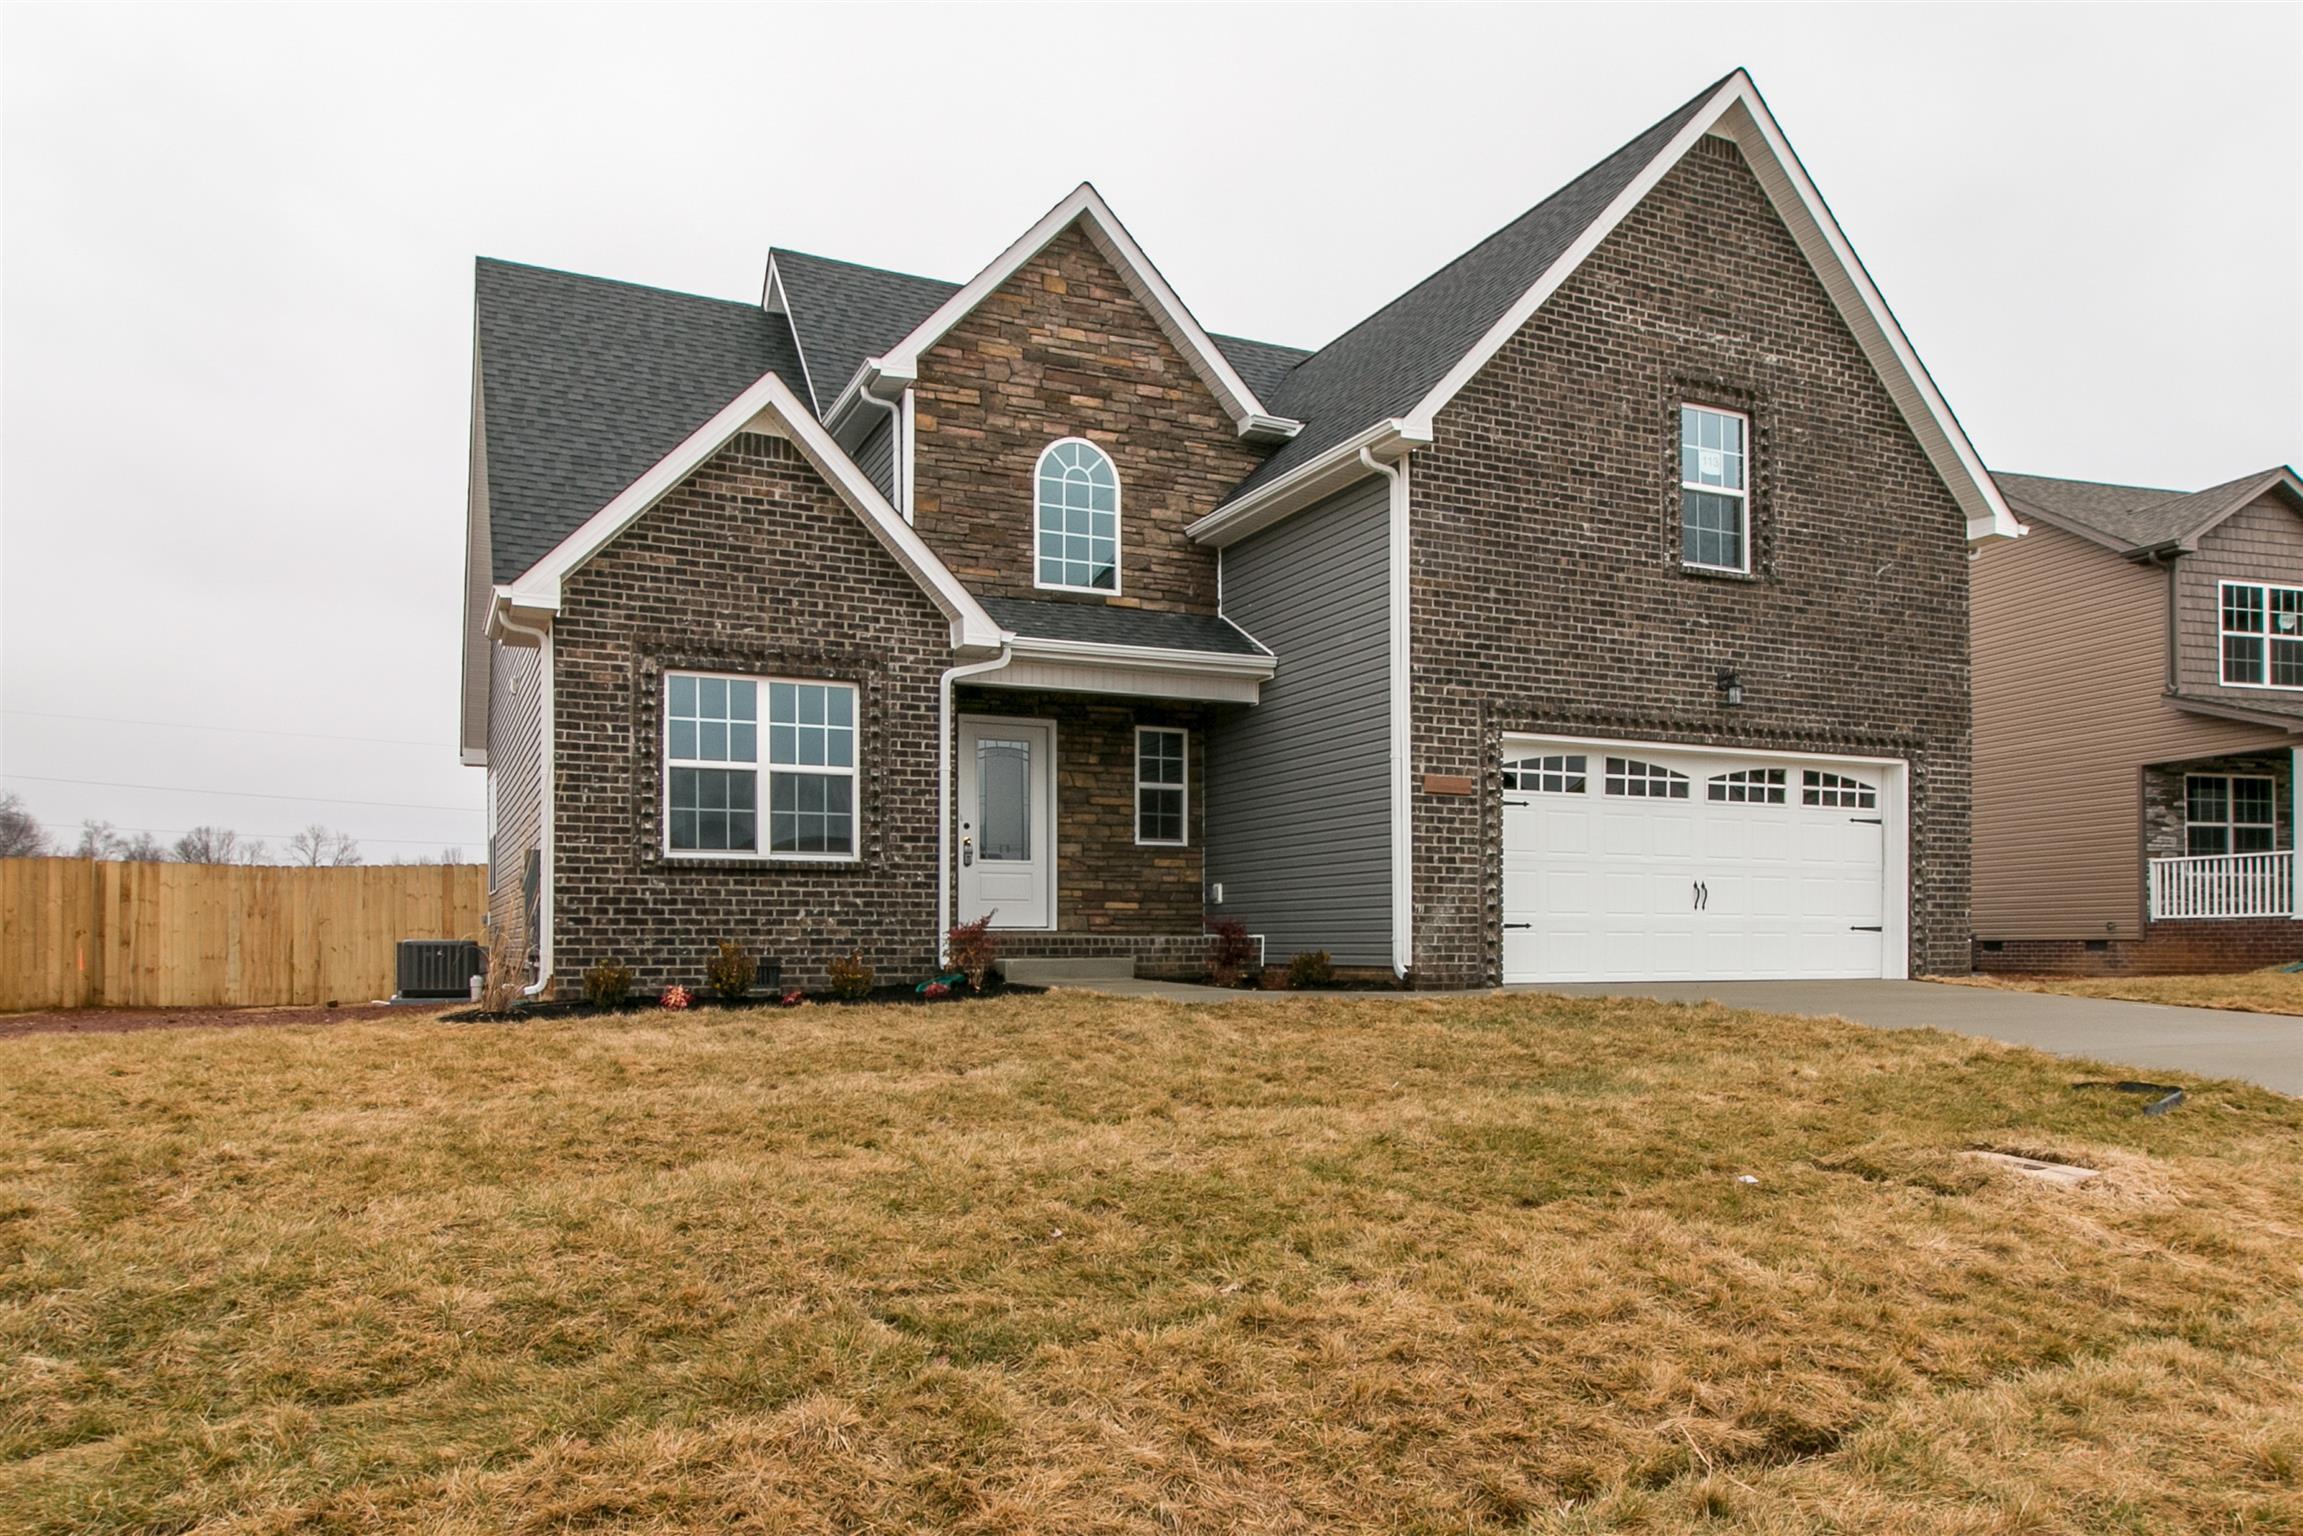 831 Crestone Ln (Lot 81), Clarksville, TN 37042 - Clarksville, TN real estate listing